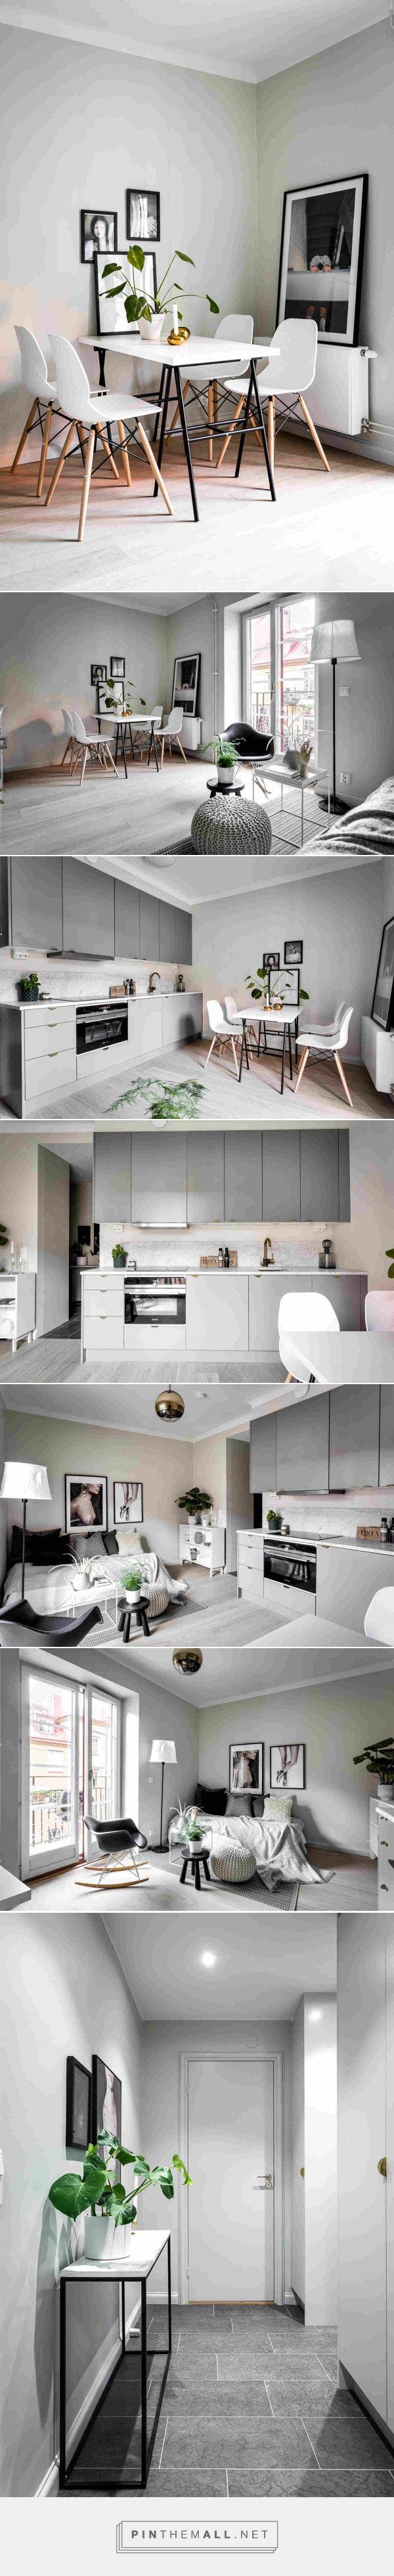 Квартира-студия площадью 23 квадратных метра — HQROOM - created via https://pinthemall.net